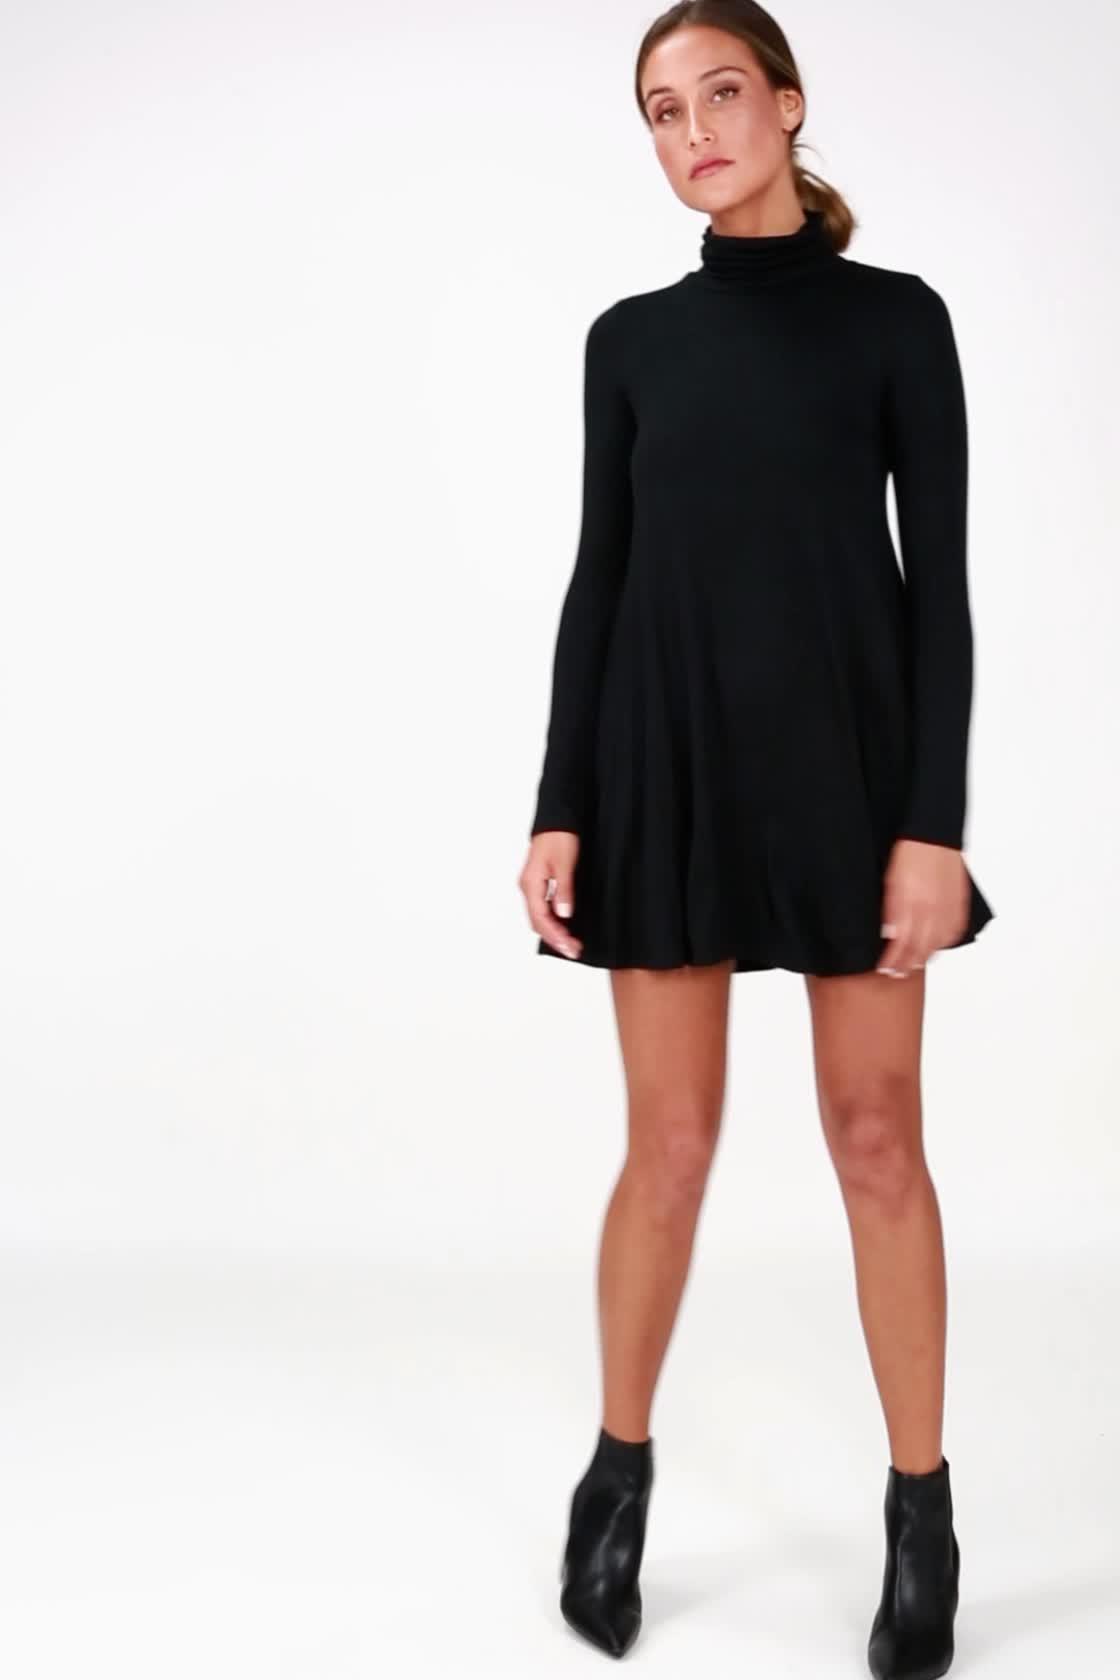 e69f88298c85 Chic Black Dress - Swing Dress - Long Sleeve Dress